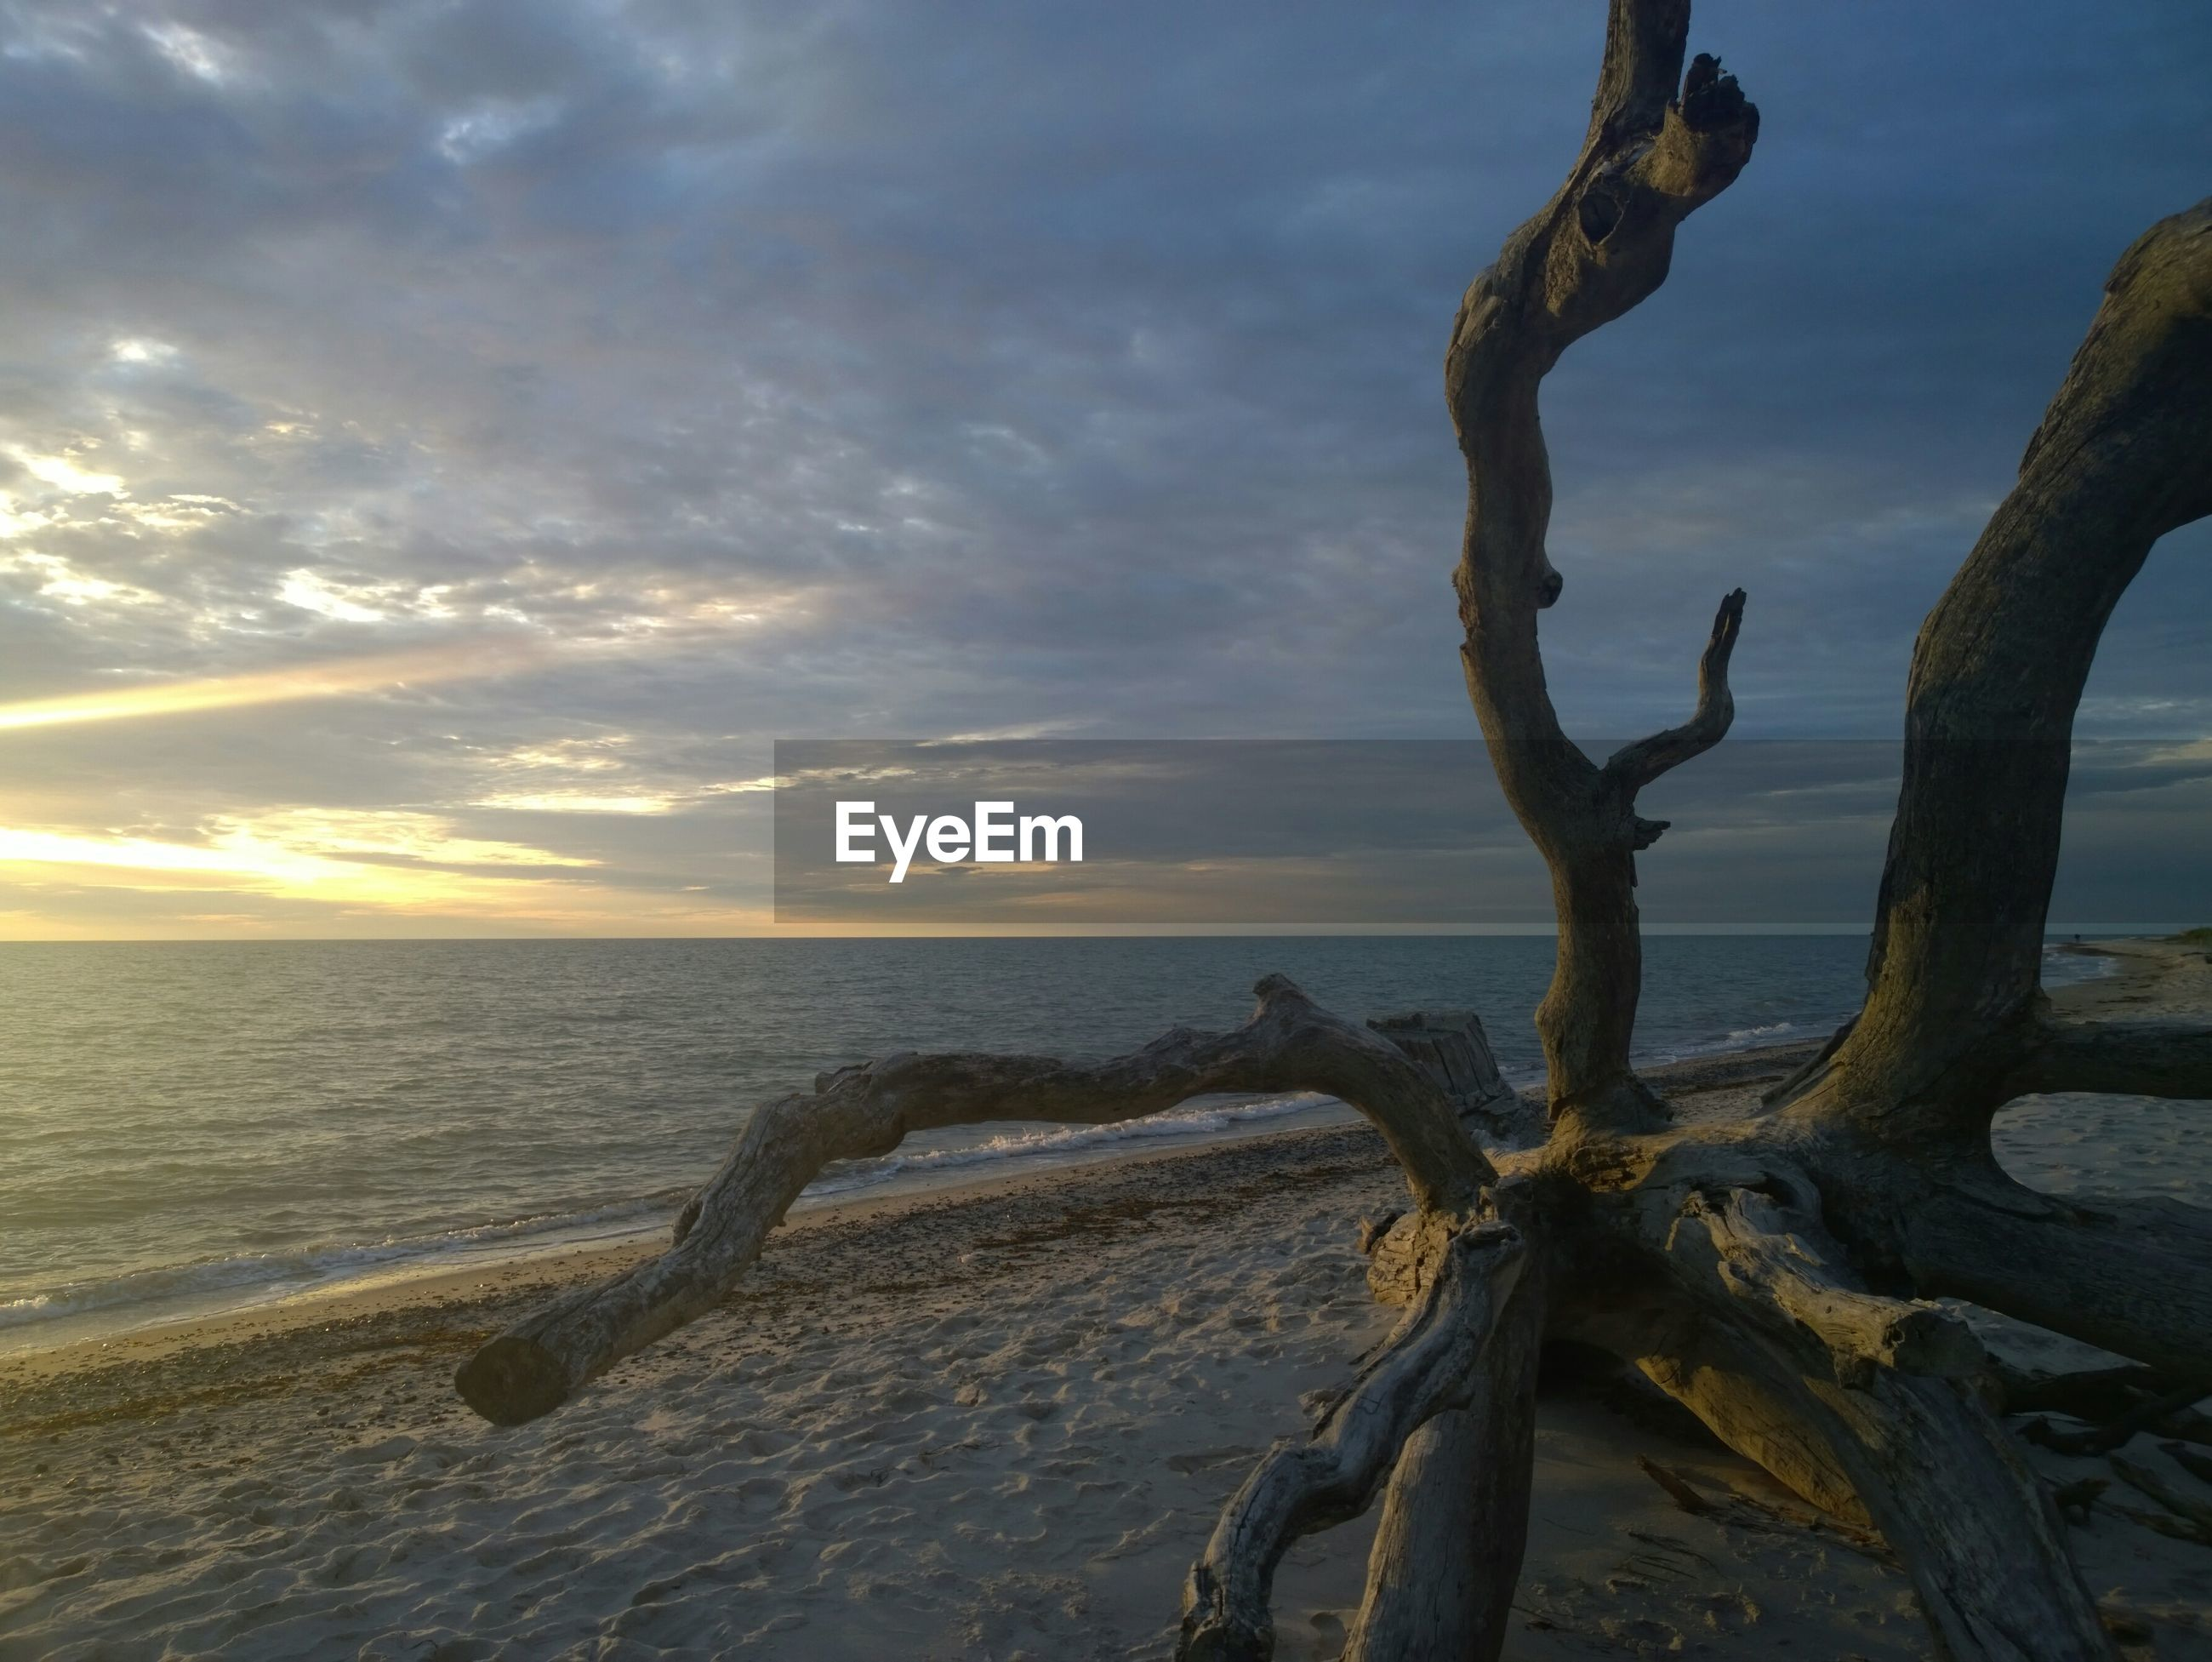 Root on beach